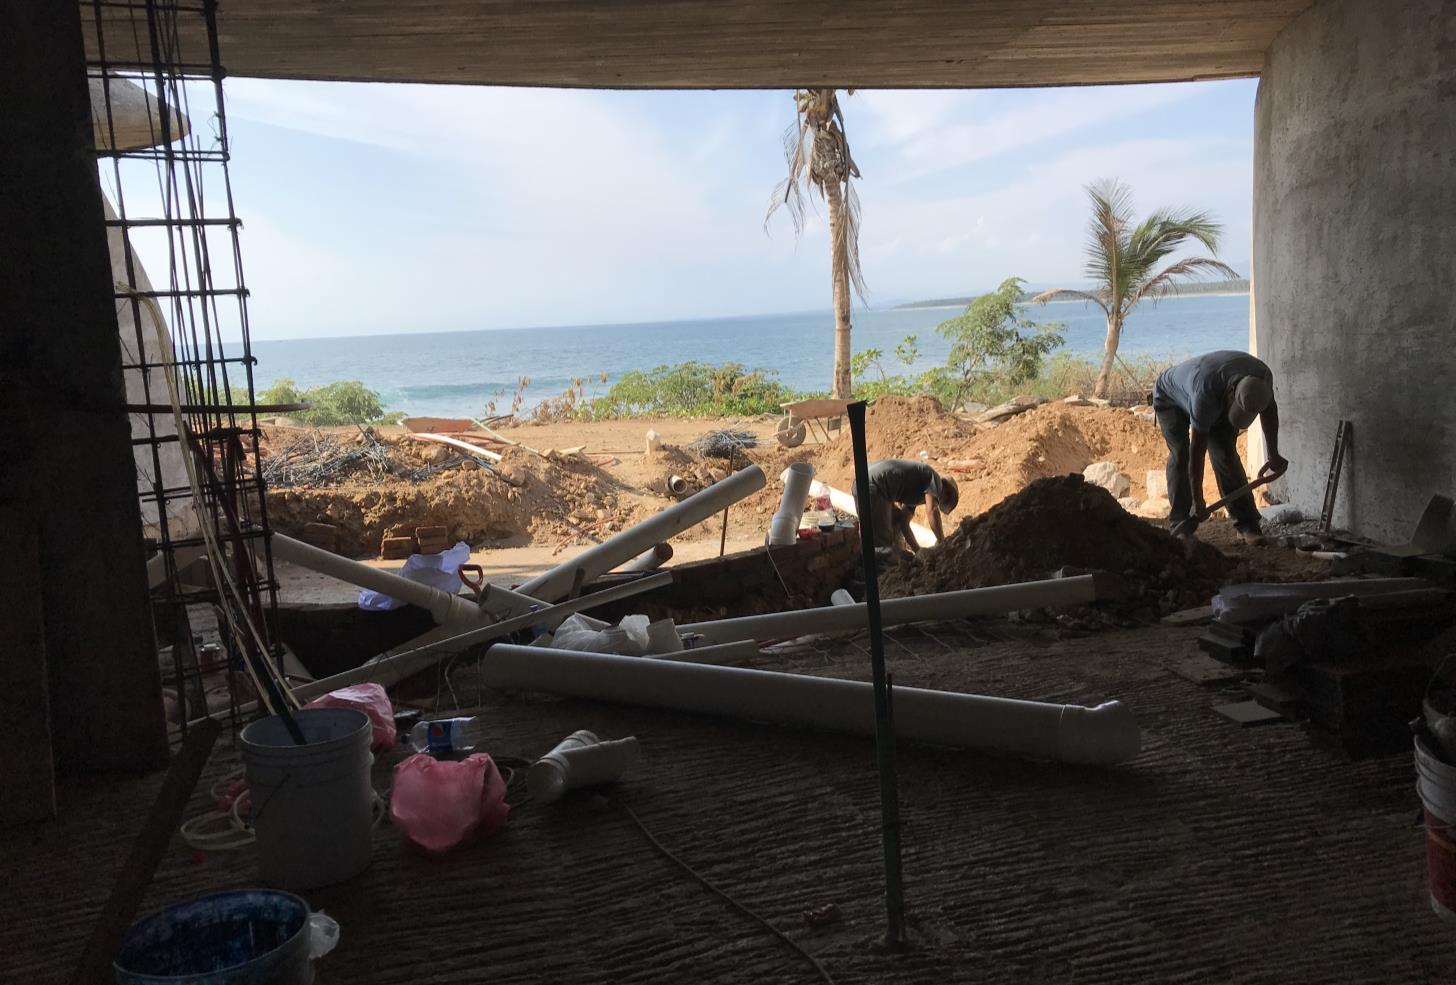 REPORTE-FOTOGRAFICO-PUNTA-MAJAHUA-09-DE-FEBRERO-DEL-2018-030.jpg